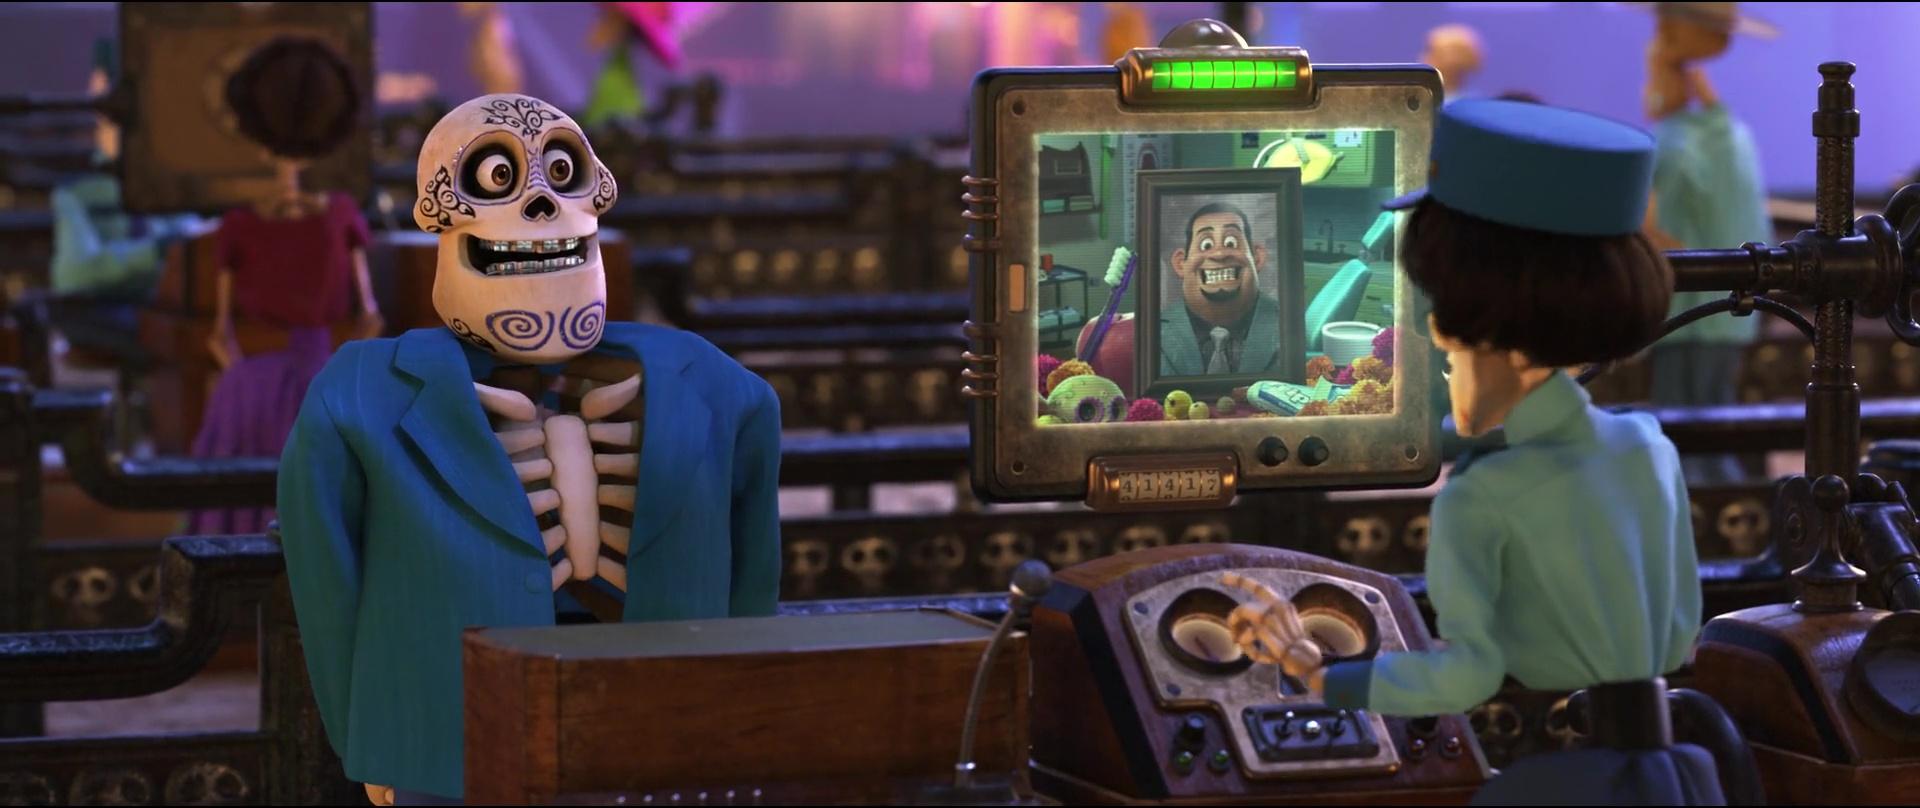 juan ortodoncia personnage character coco disney pixar